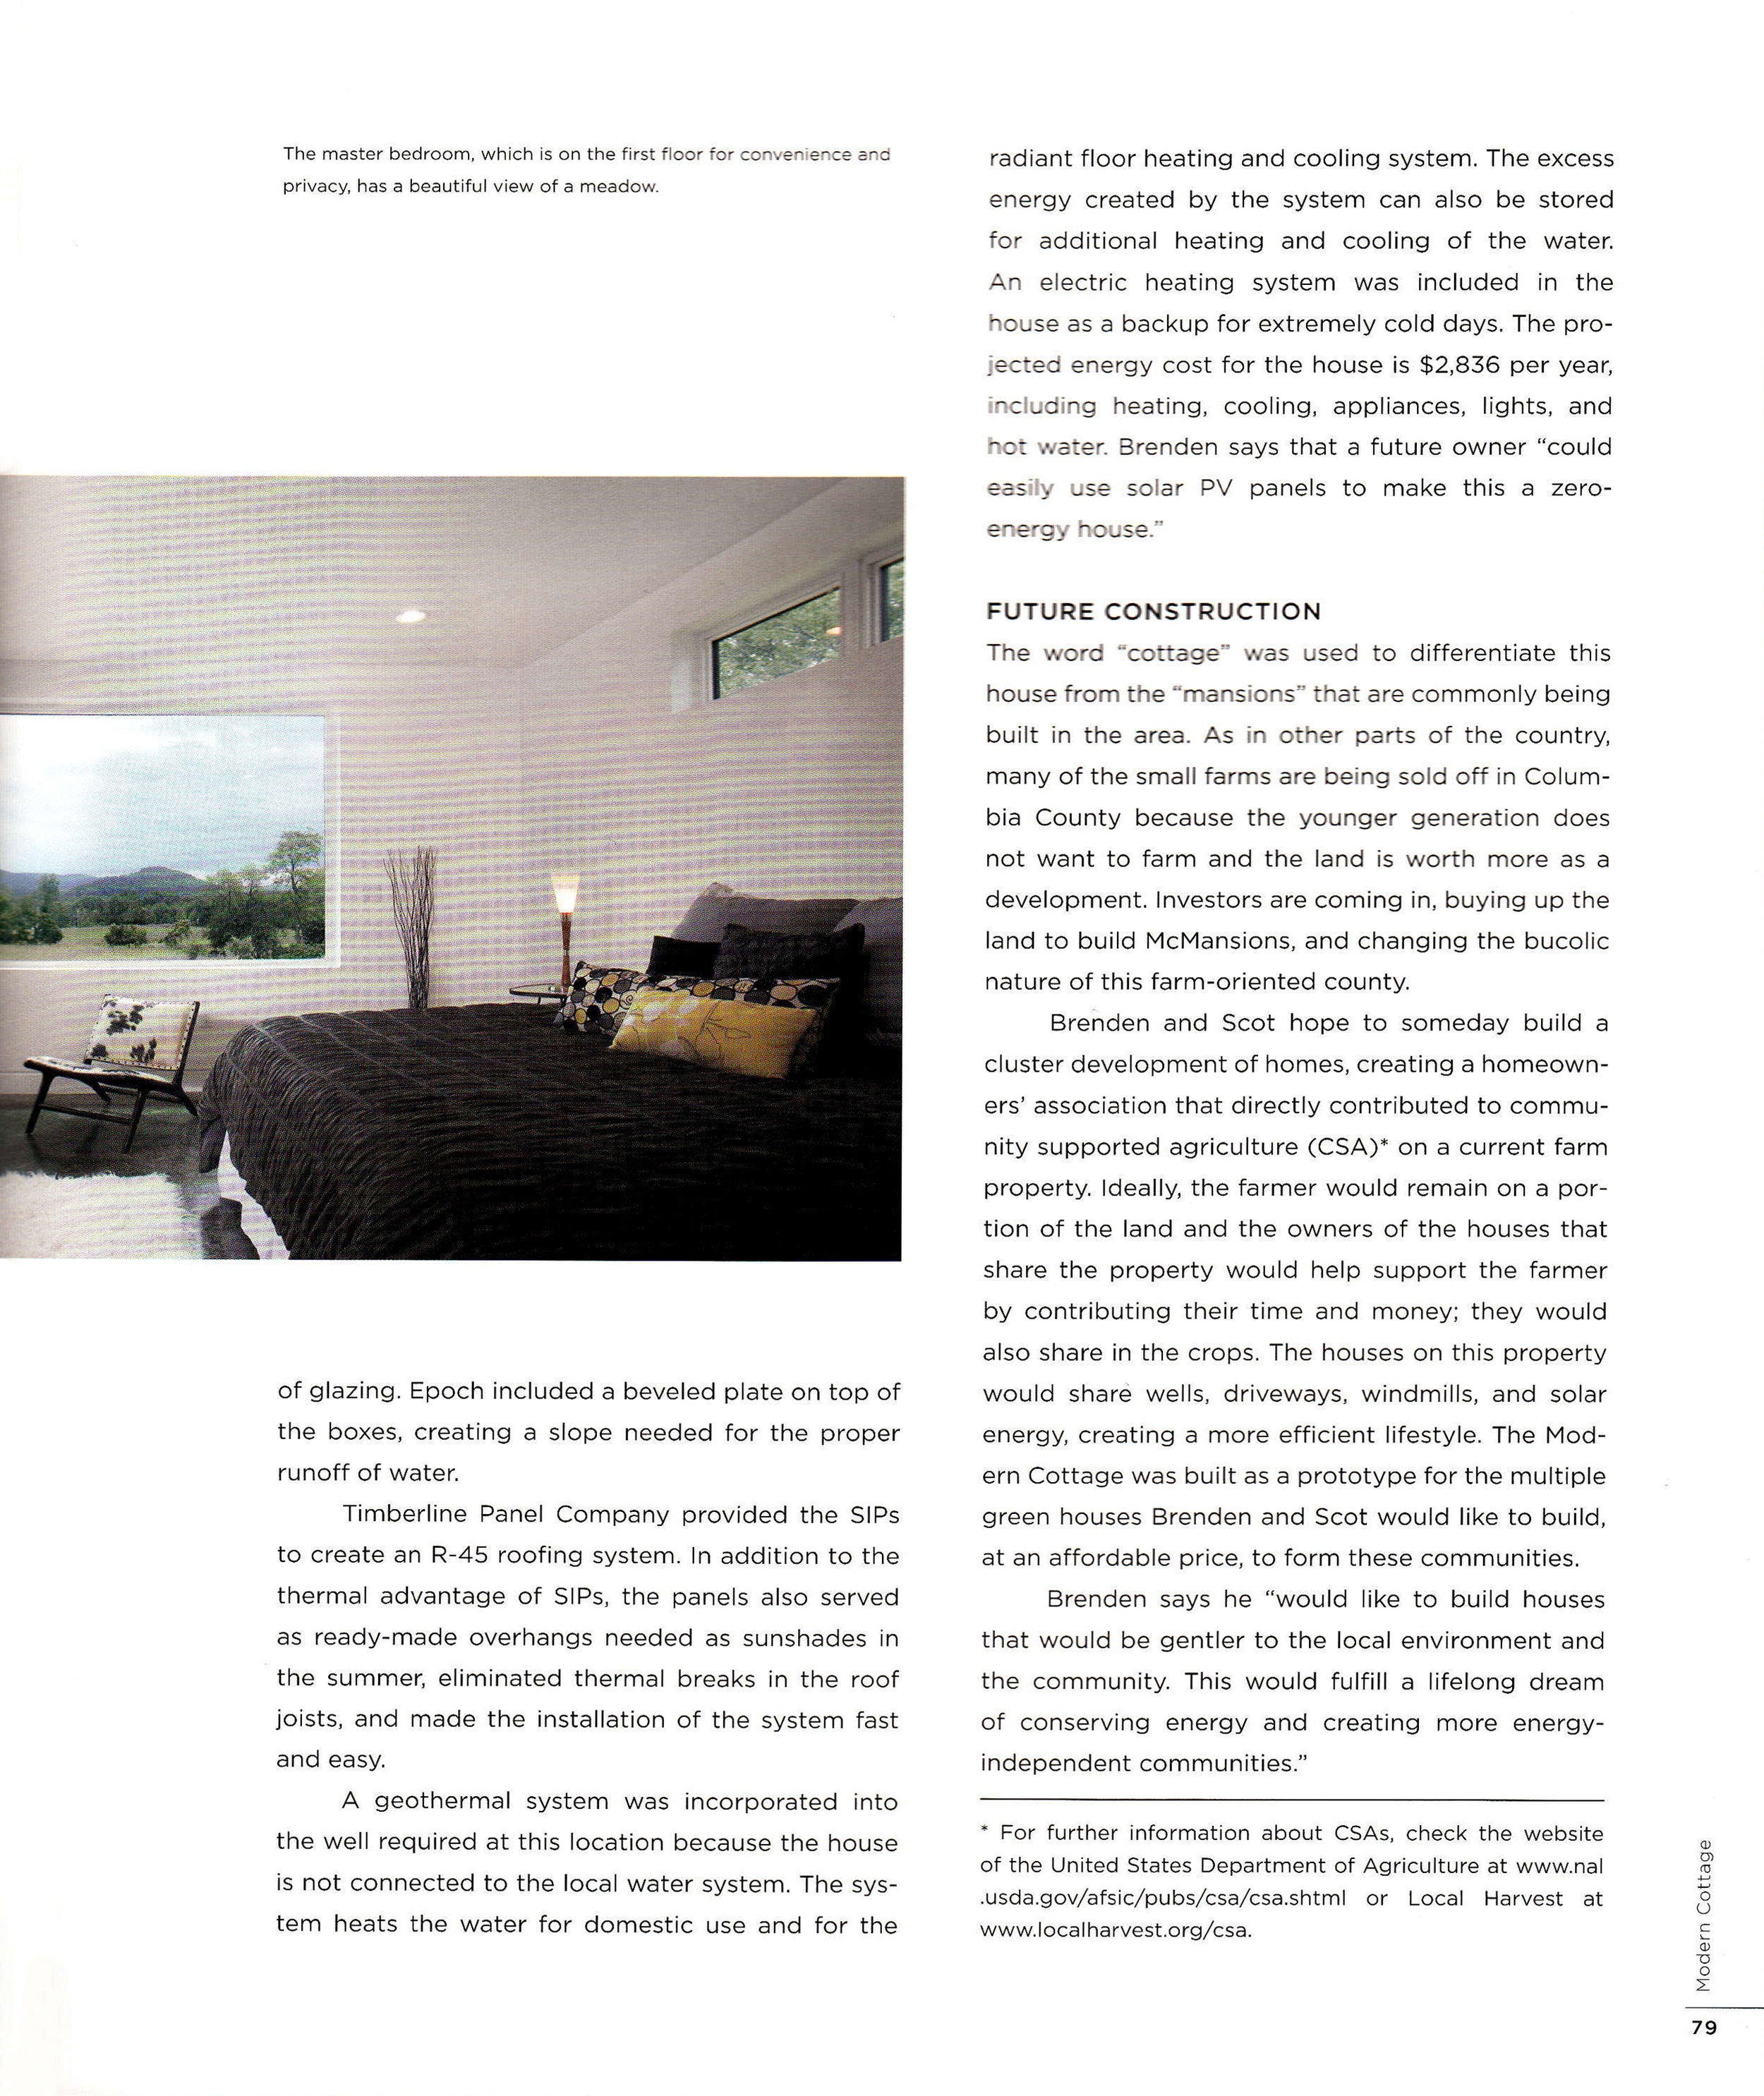 turkel_design_prefab_press_Modern_Cottage_Prefabuolus.8.jpg